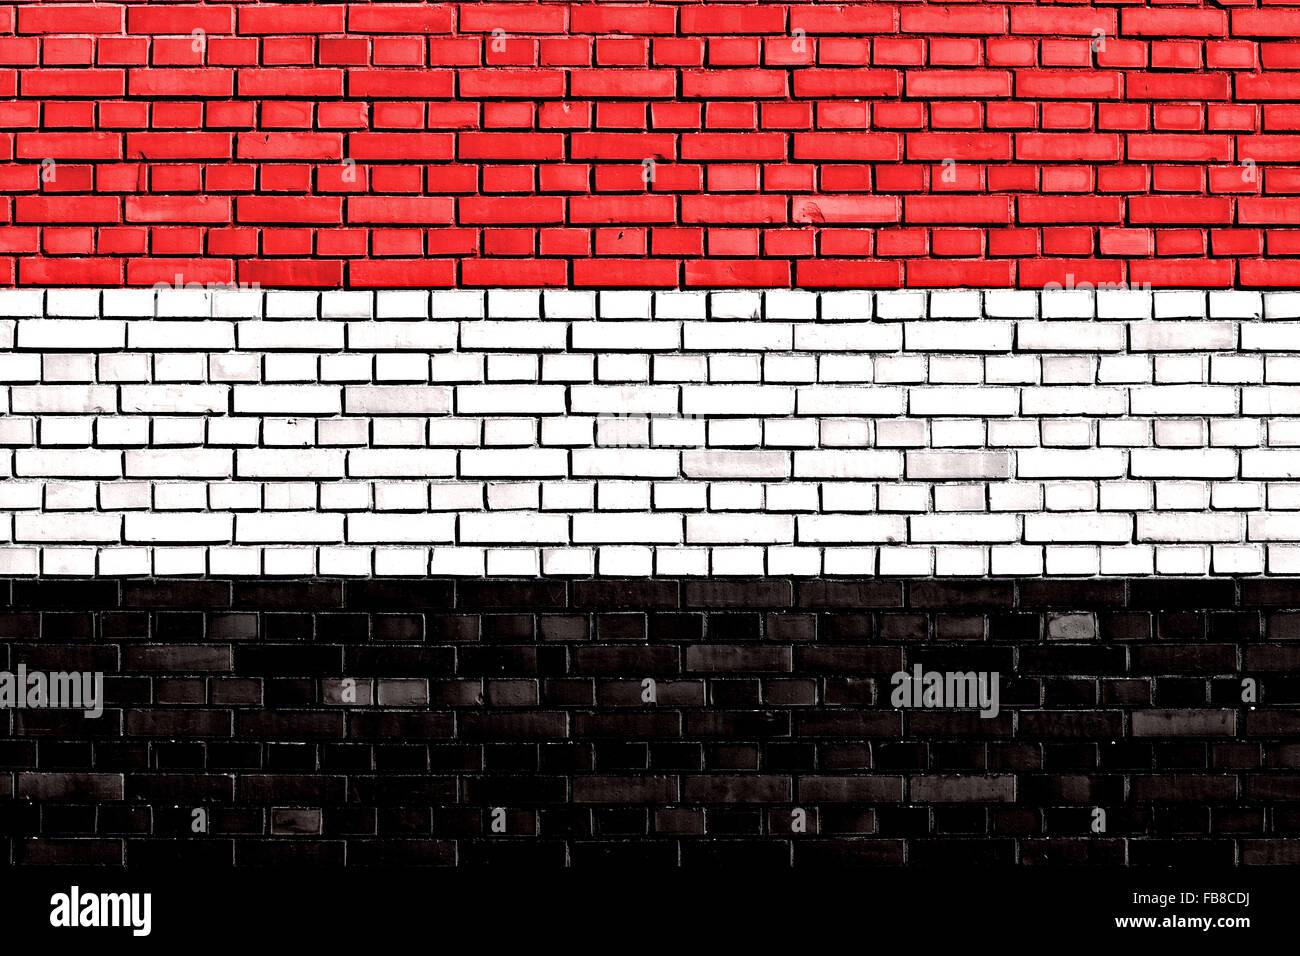 flag of Yemen painted on brick wall - Stock Image